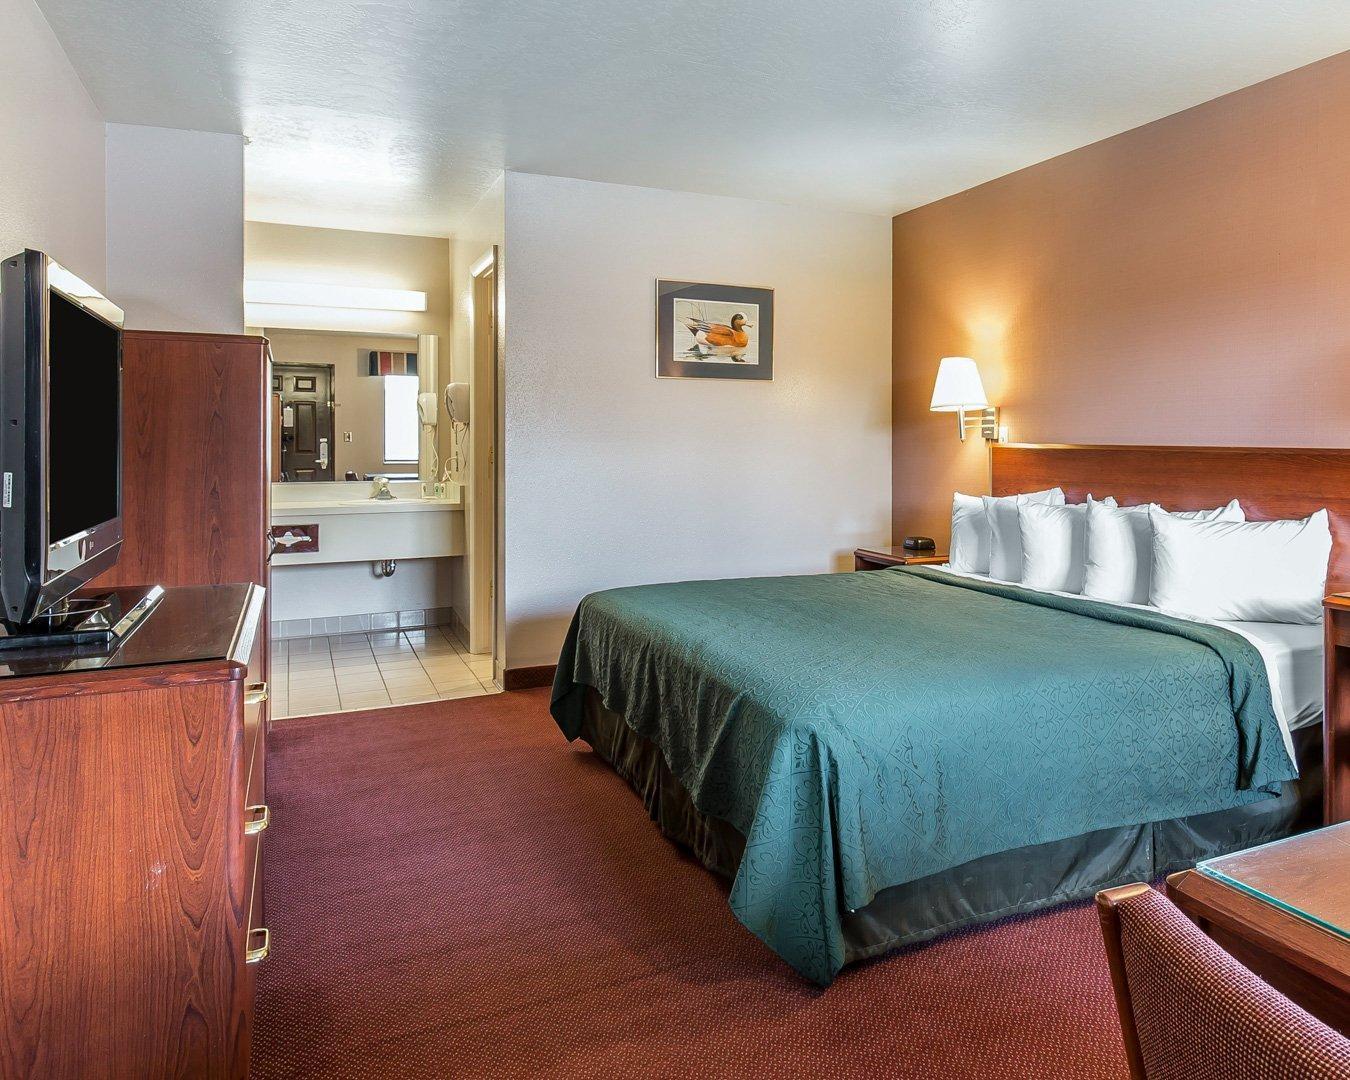 Quality Inn, www.choicehotels.com UT